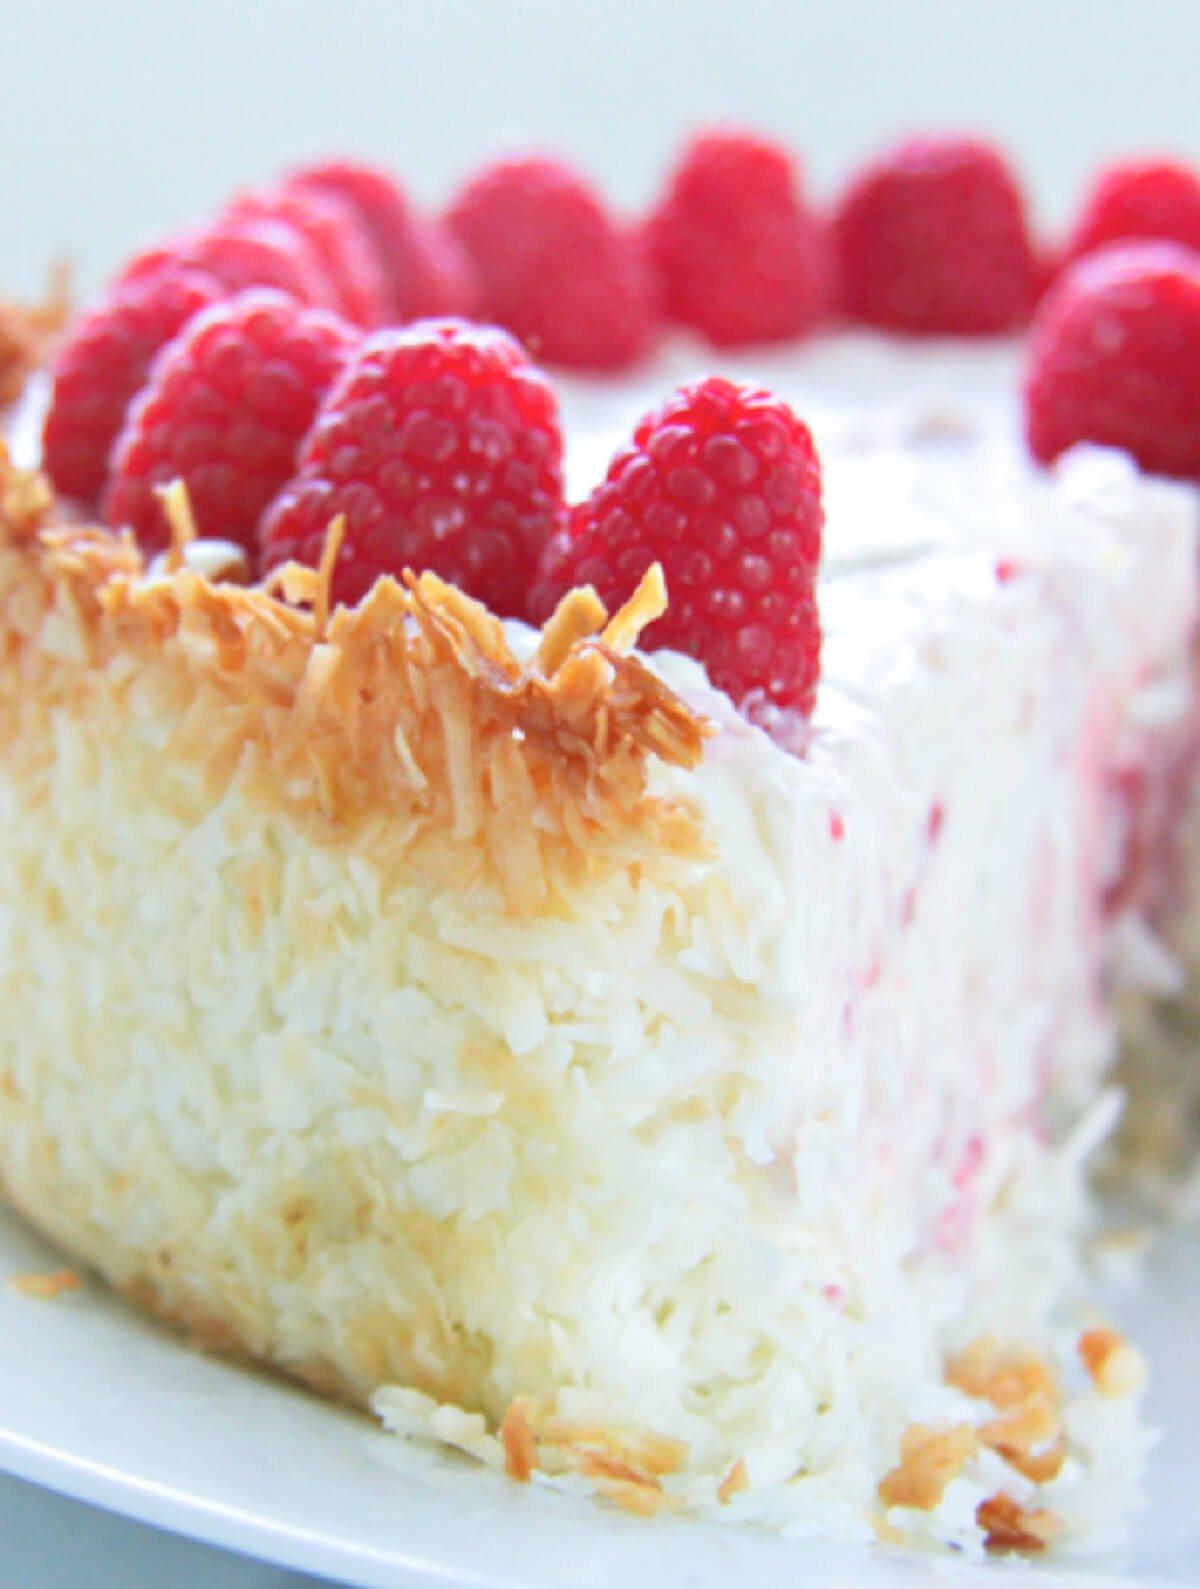 Raspberry Cheesecake Filling For Cake